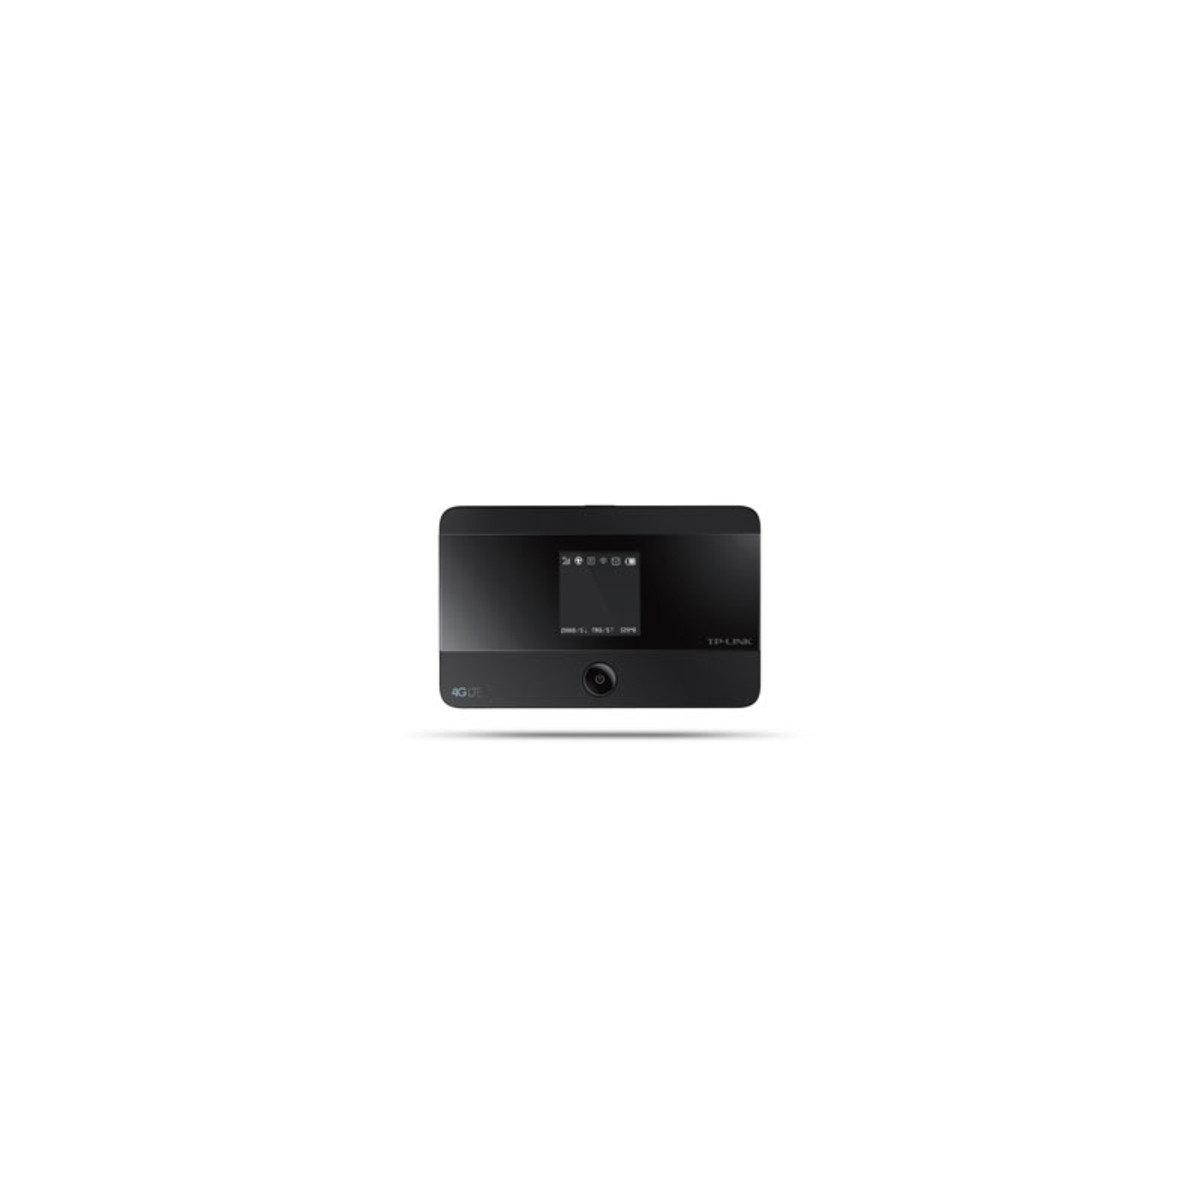 4G-LTE Cat.4 150Mbps 行動網絡無線分享器 M7350 [4G蛋]